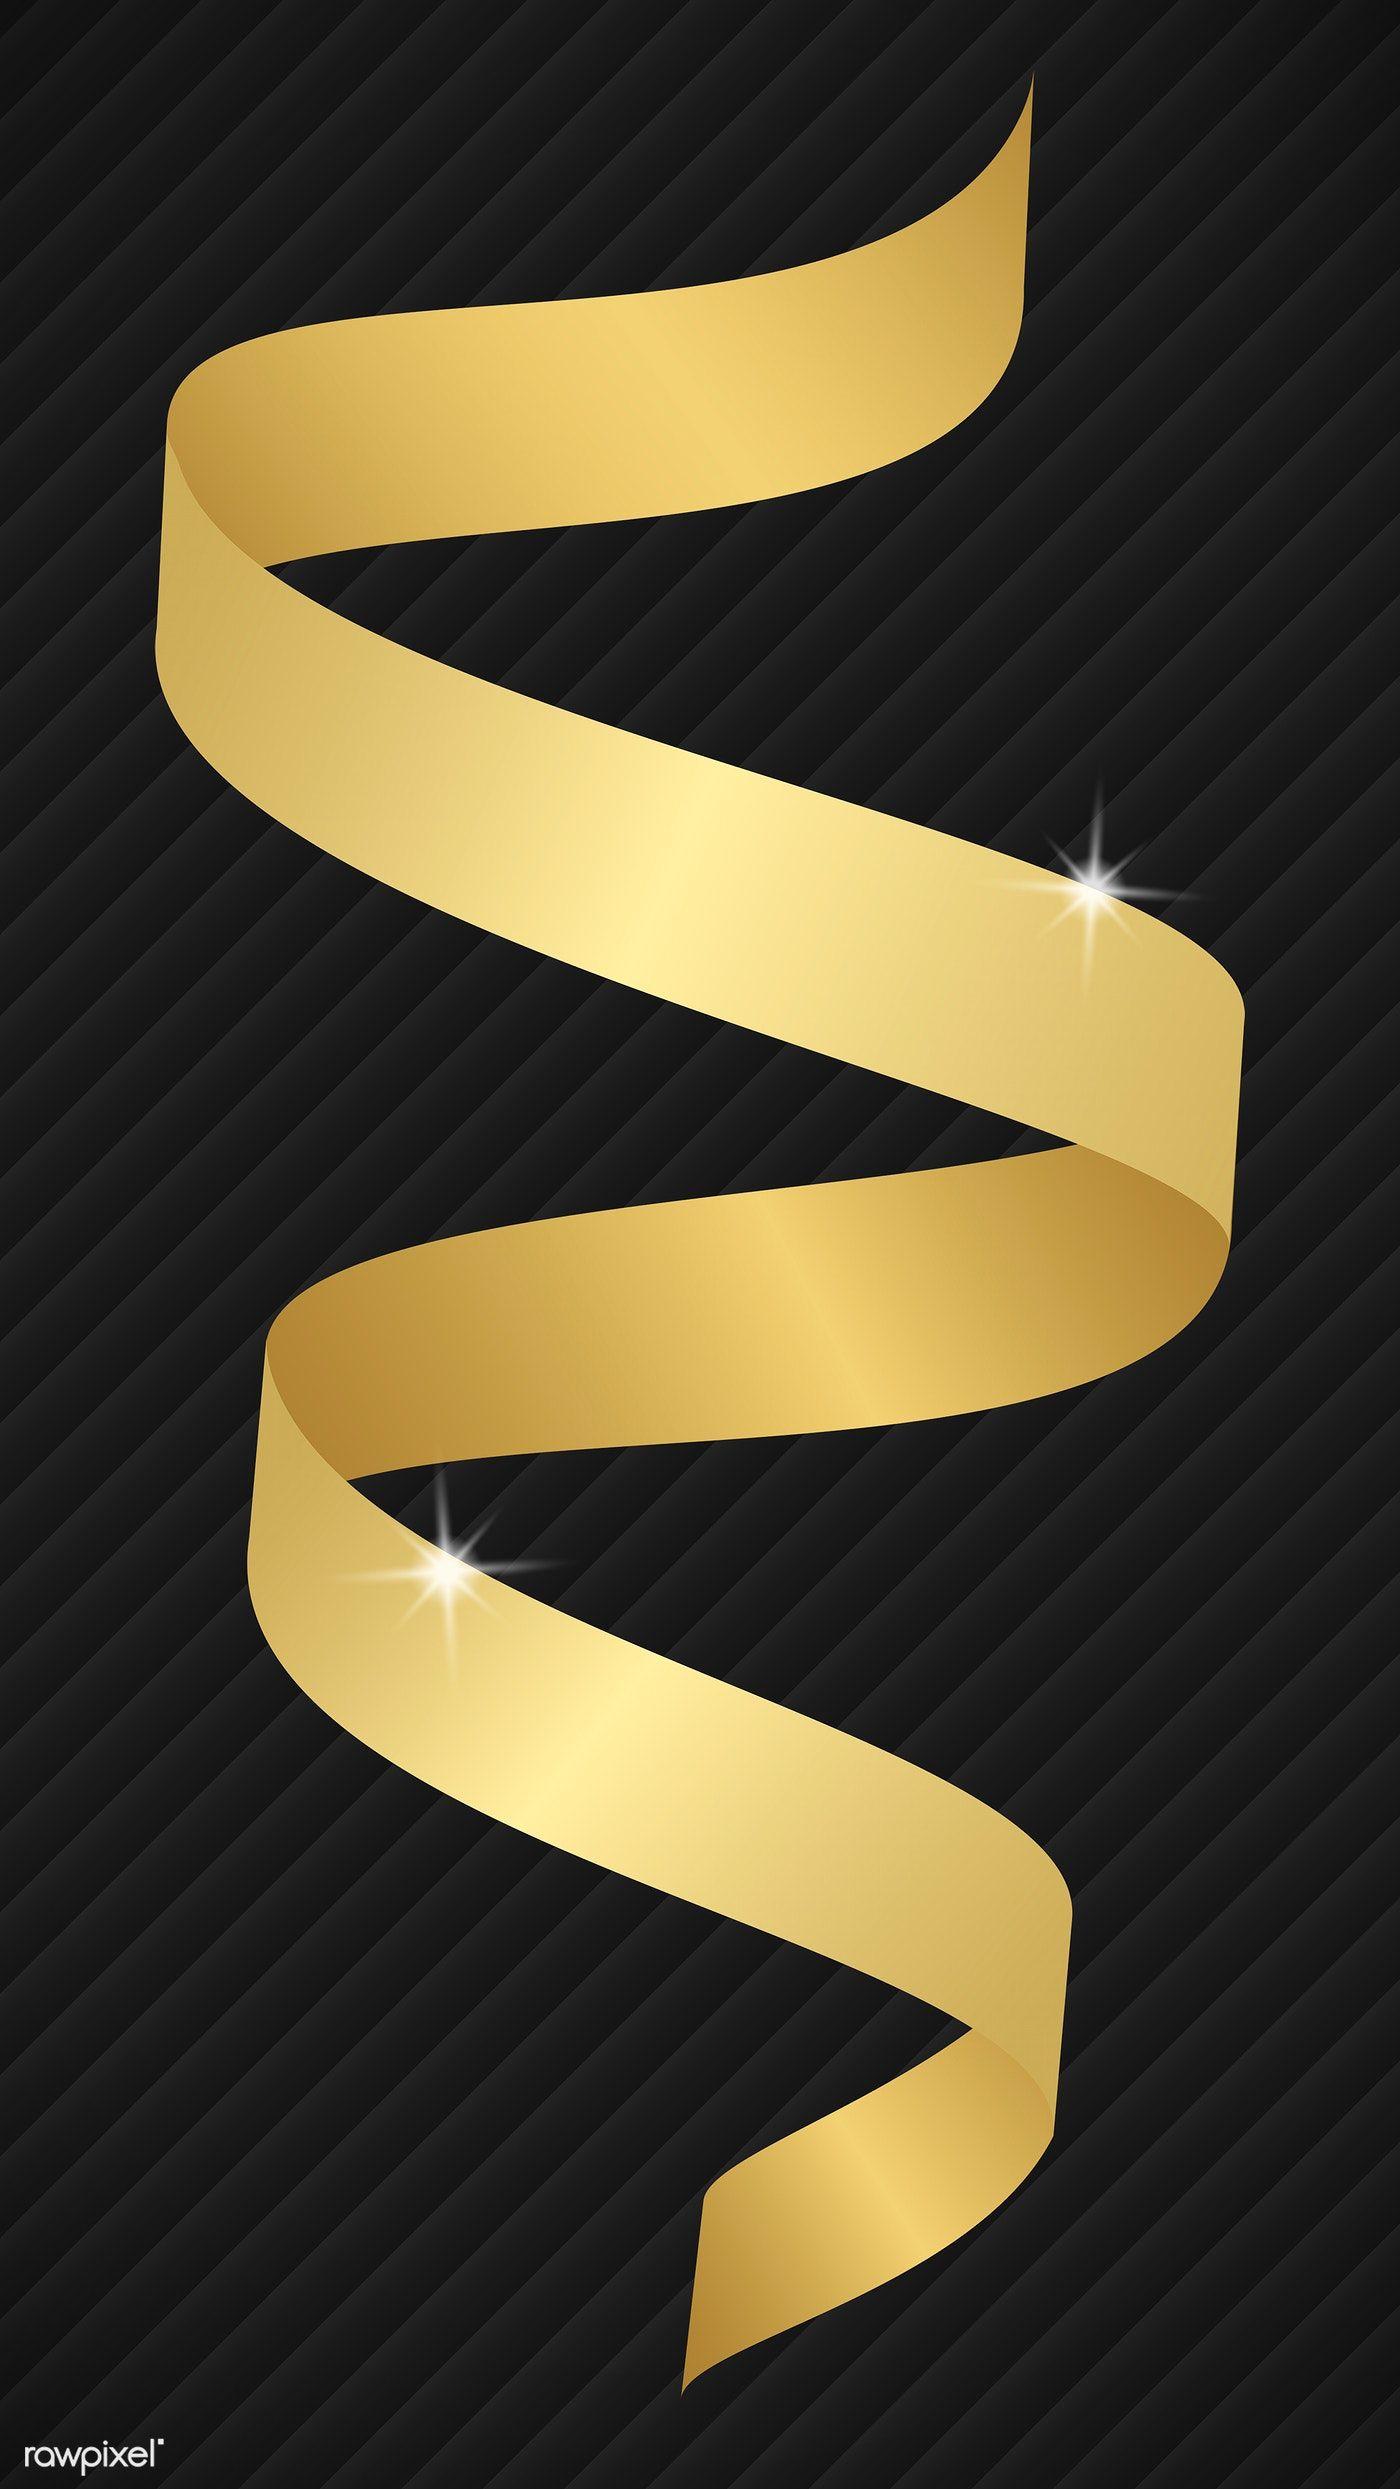 Download Premium Illustration Of Gold Ribbon Element Illustration 1234213 Gold Ribbons Illustration Ribbon Design